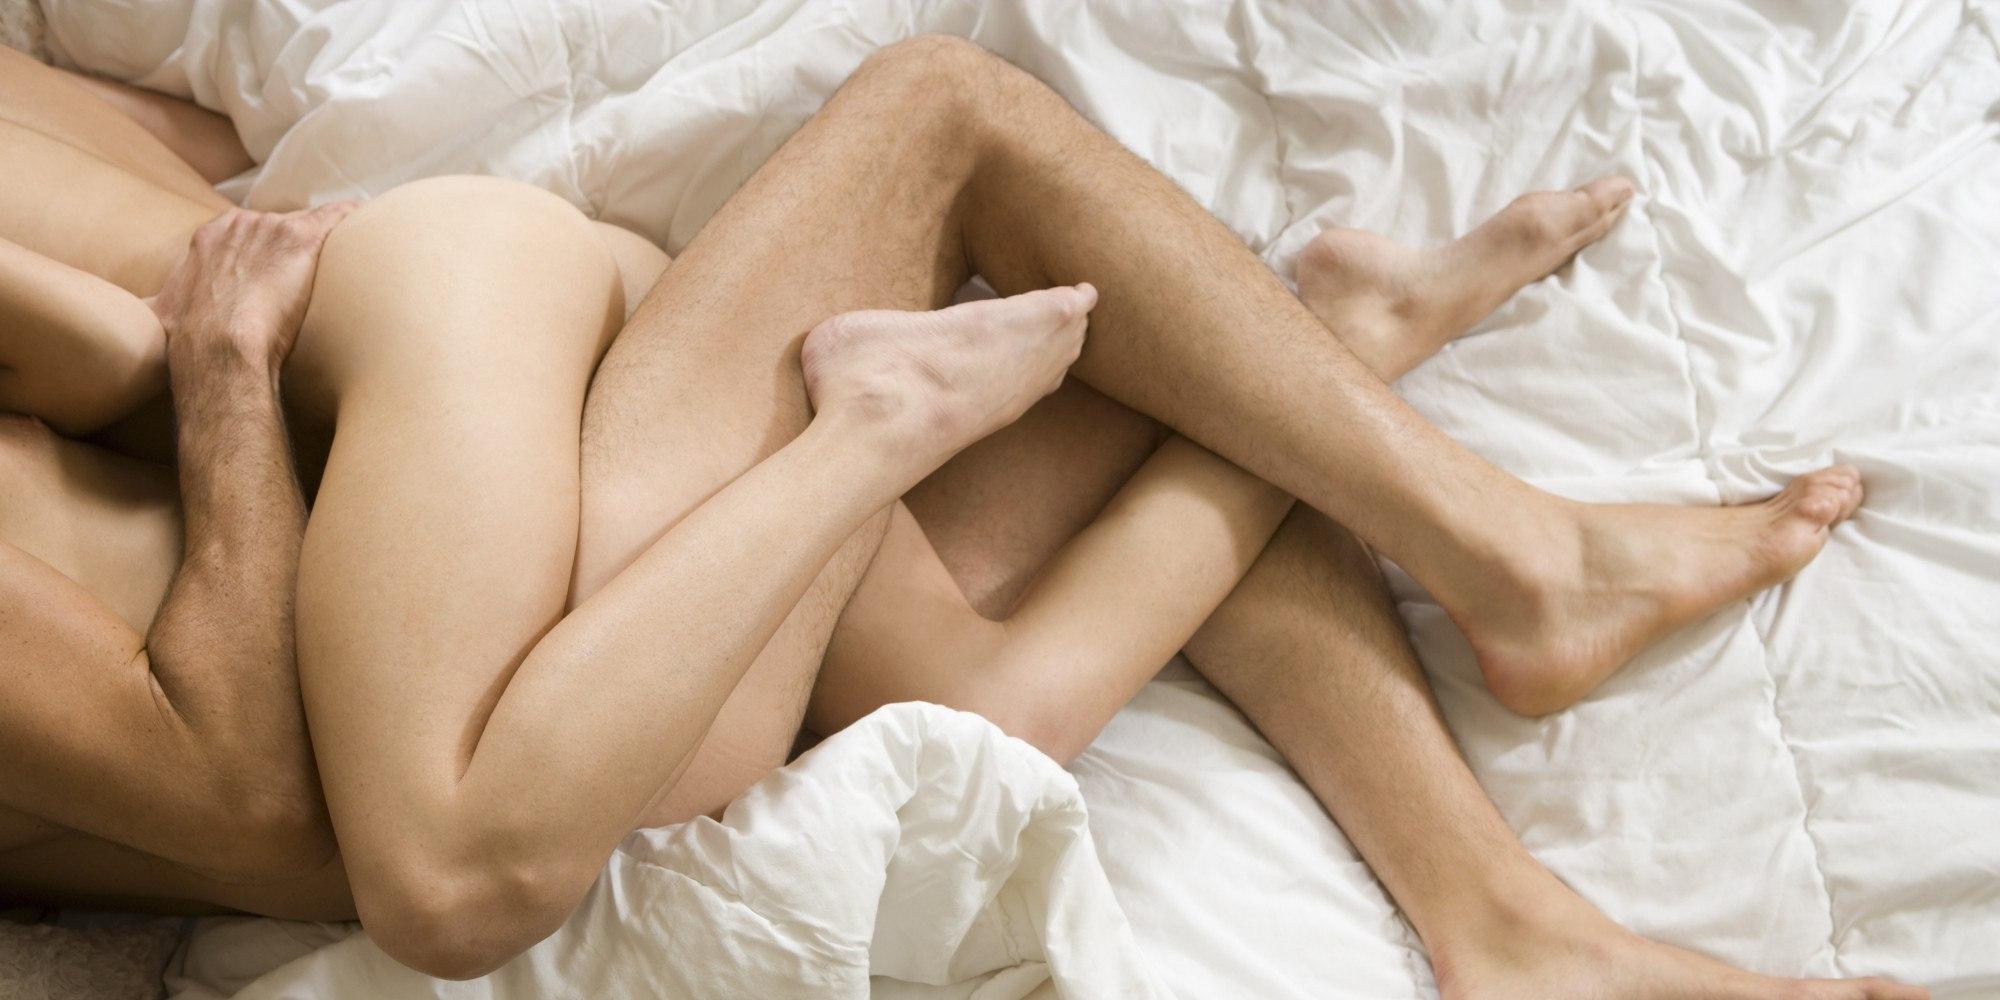 Слушать онлайн звуки при секса 19 фотография